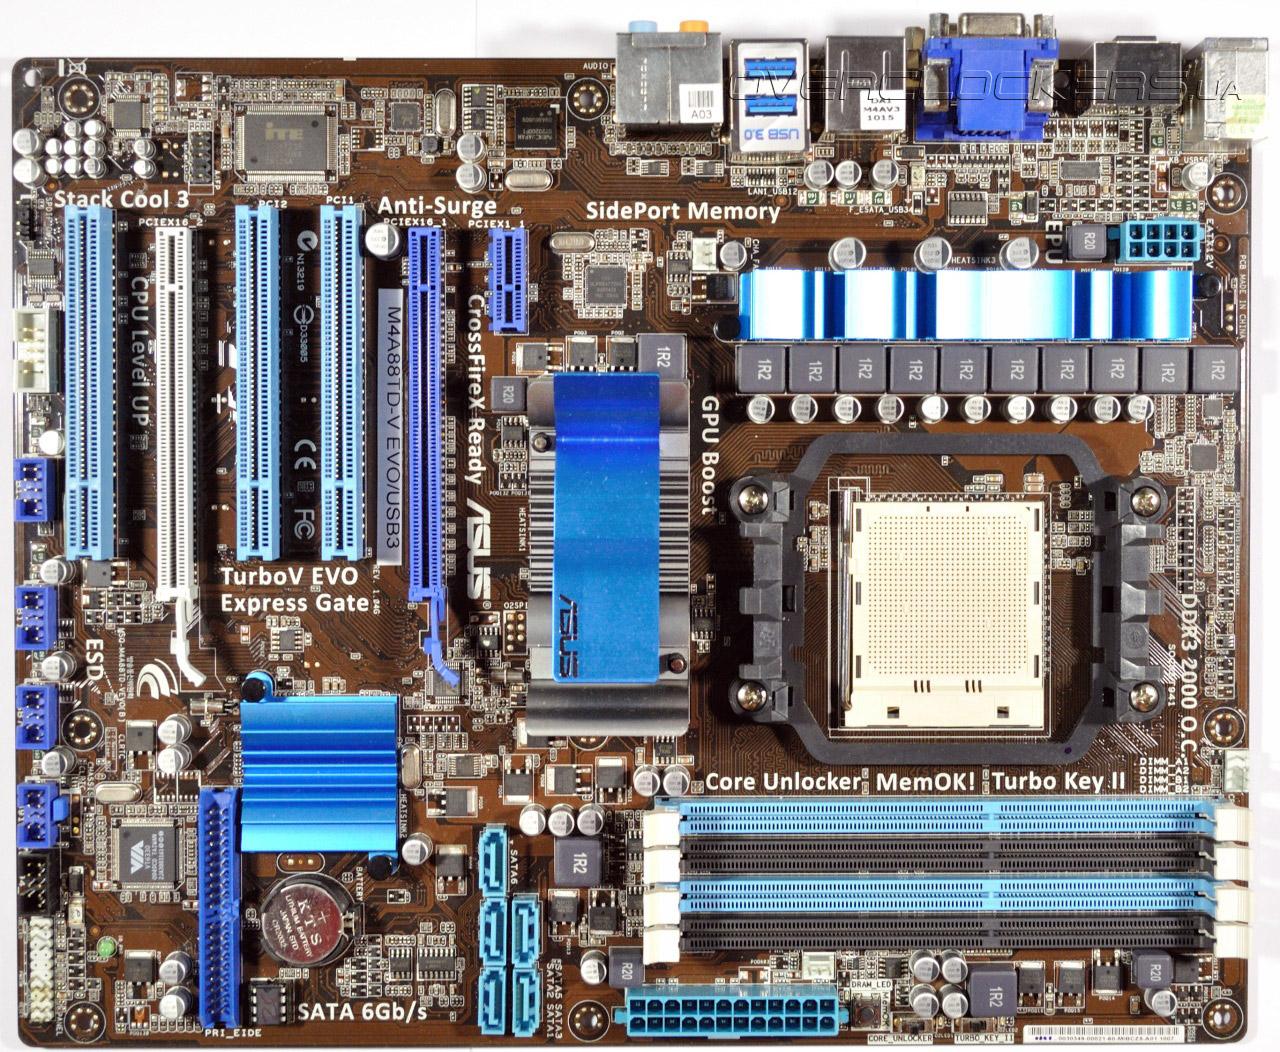 ASUS M4A88TD-V EVO/USB3 AMD SATA RAID/AHCI DRIVERS